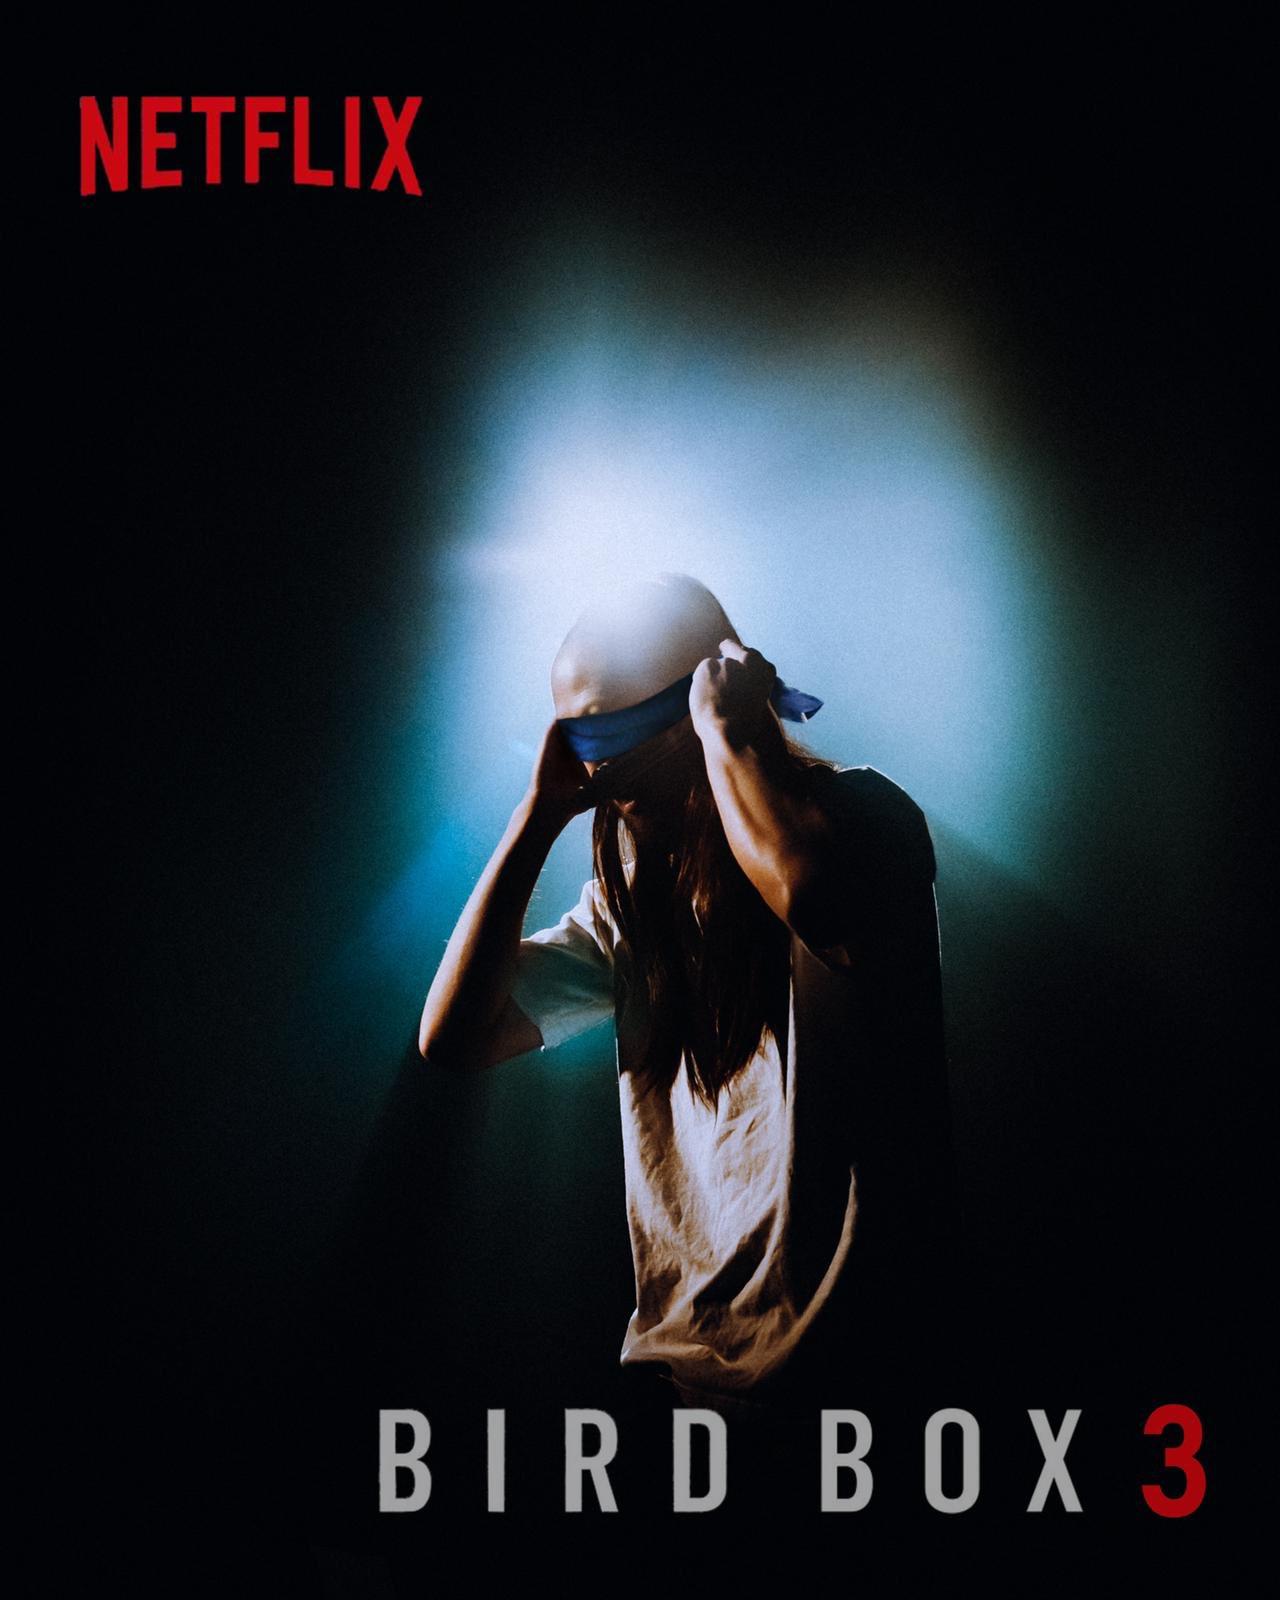 Coming soon, after Bird Box 2. Probably. ���� #birdbox https://t.co/7ByaKpAqb4